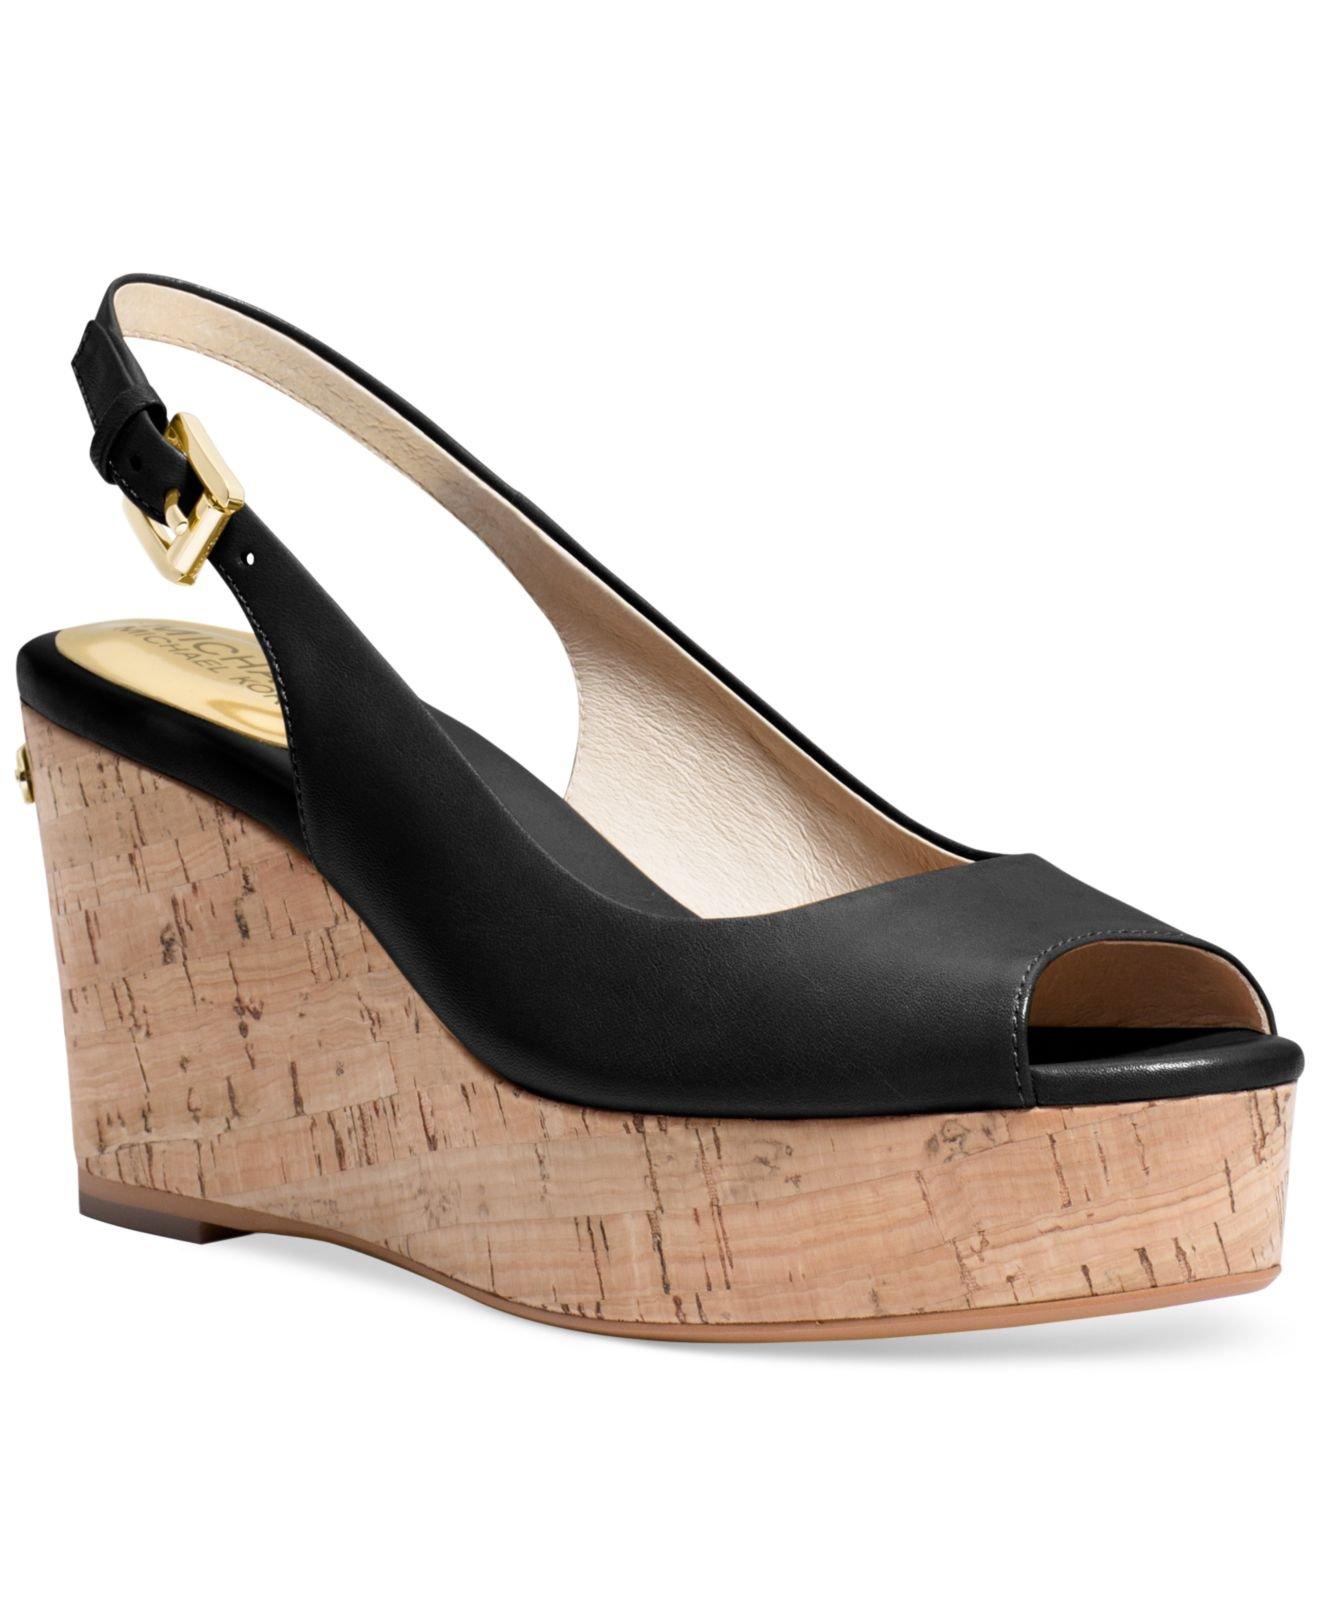 d16da1eeb99 ... Lyst - Michael Kors Michael Natalia Platform Sandals in Blac ...